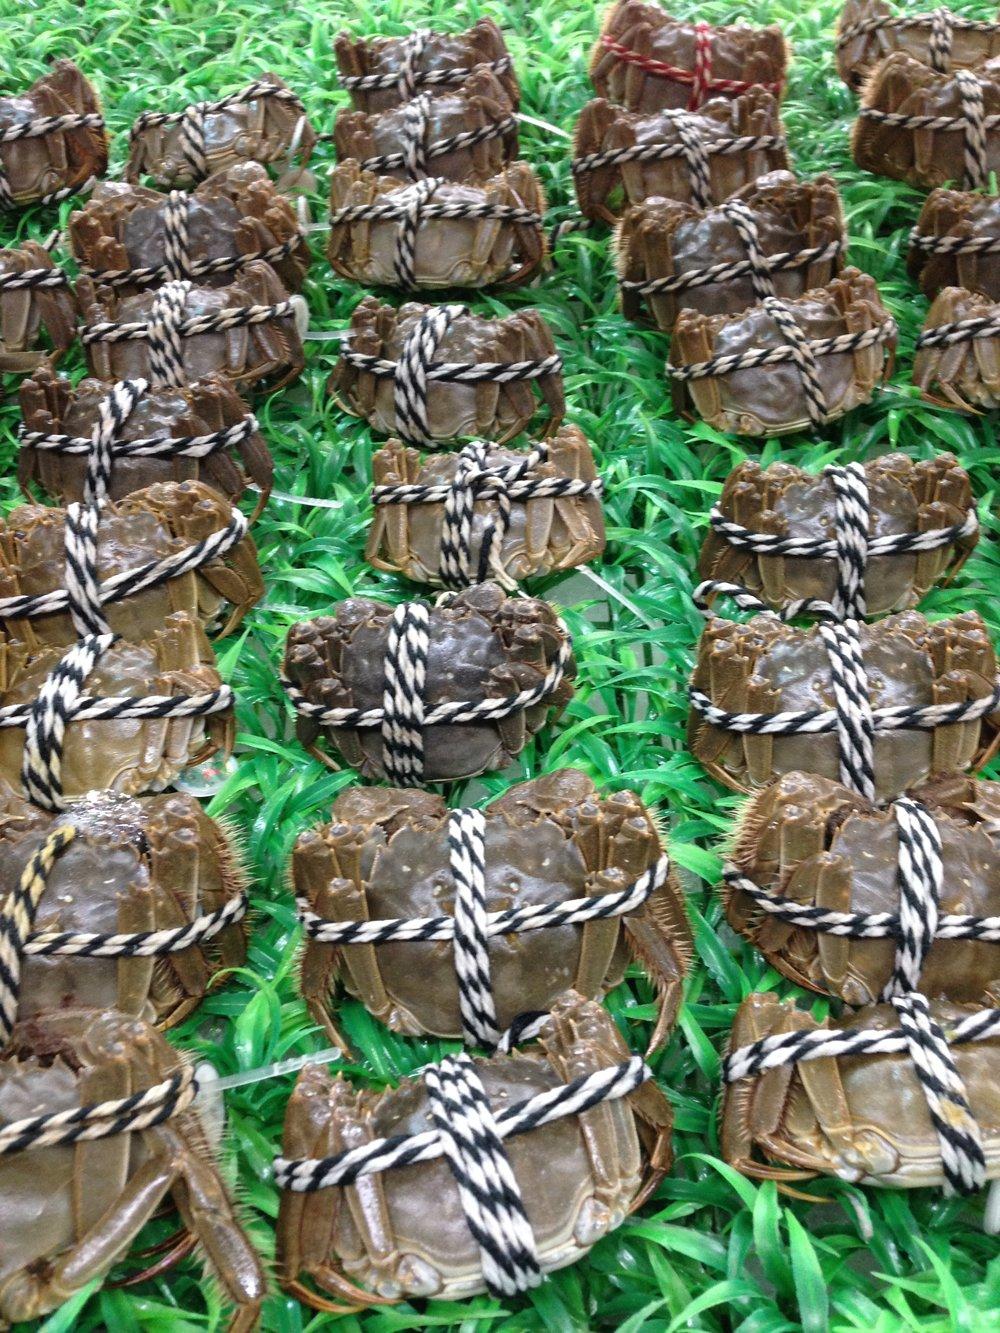 Fresh live crabs.